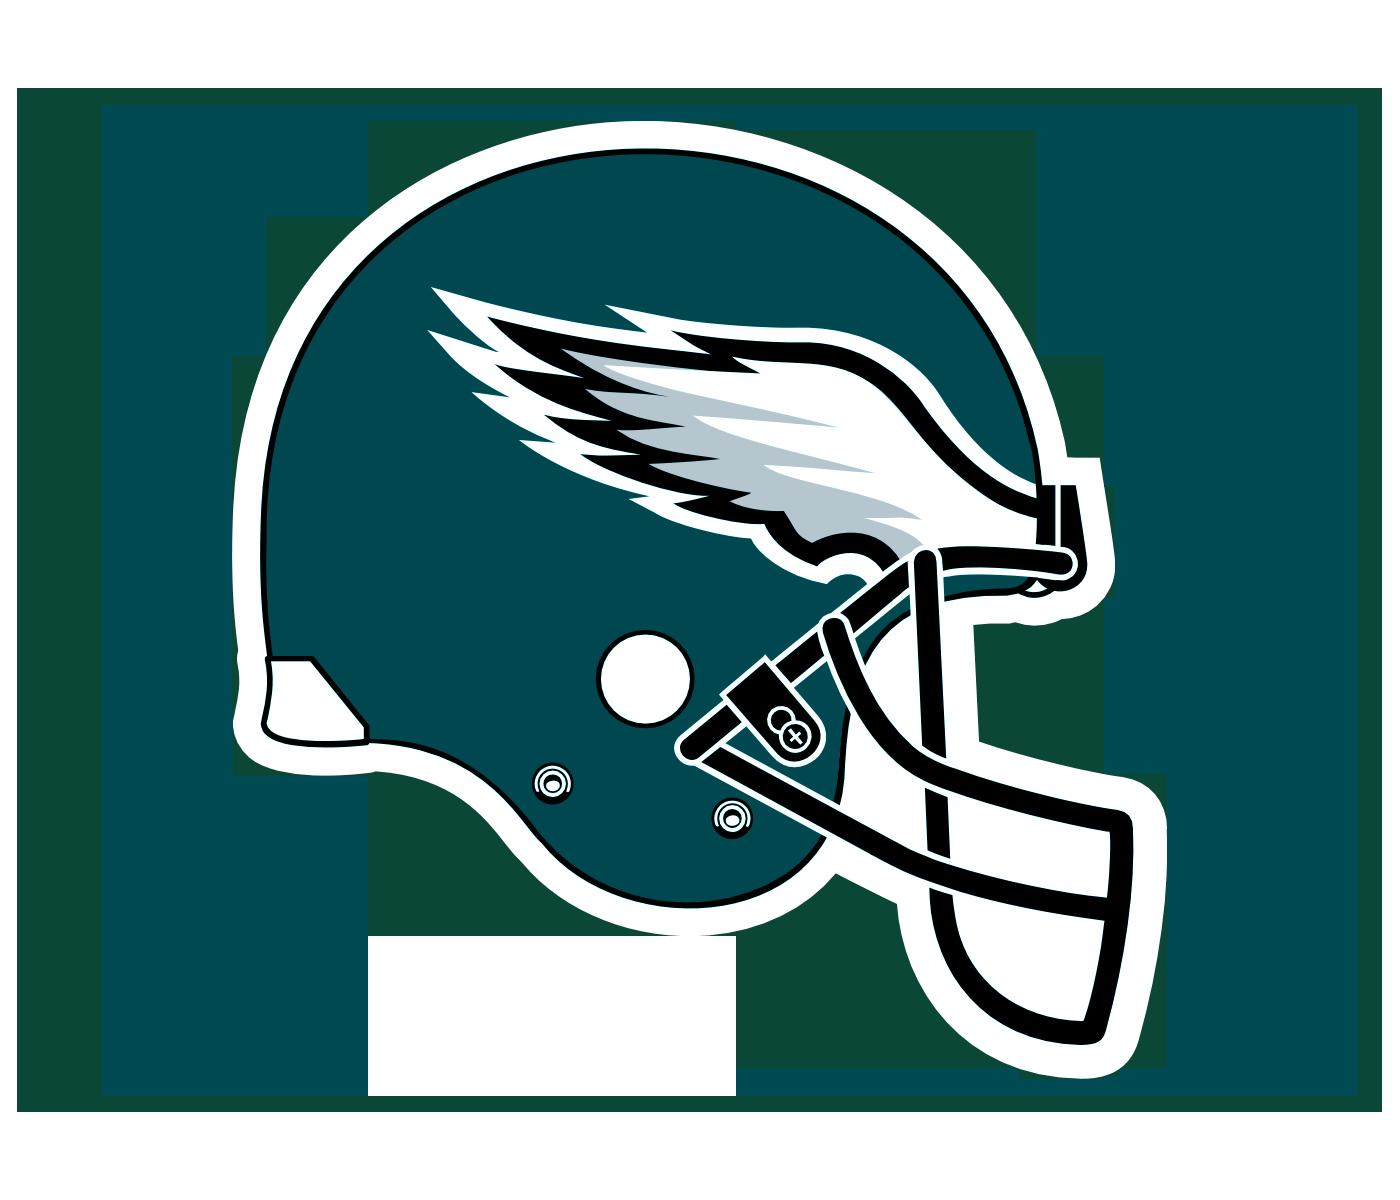 Philadelphia clipart free on. Eagles helmet png